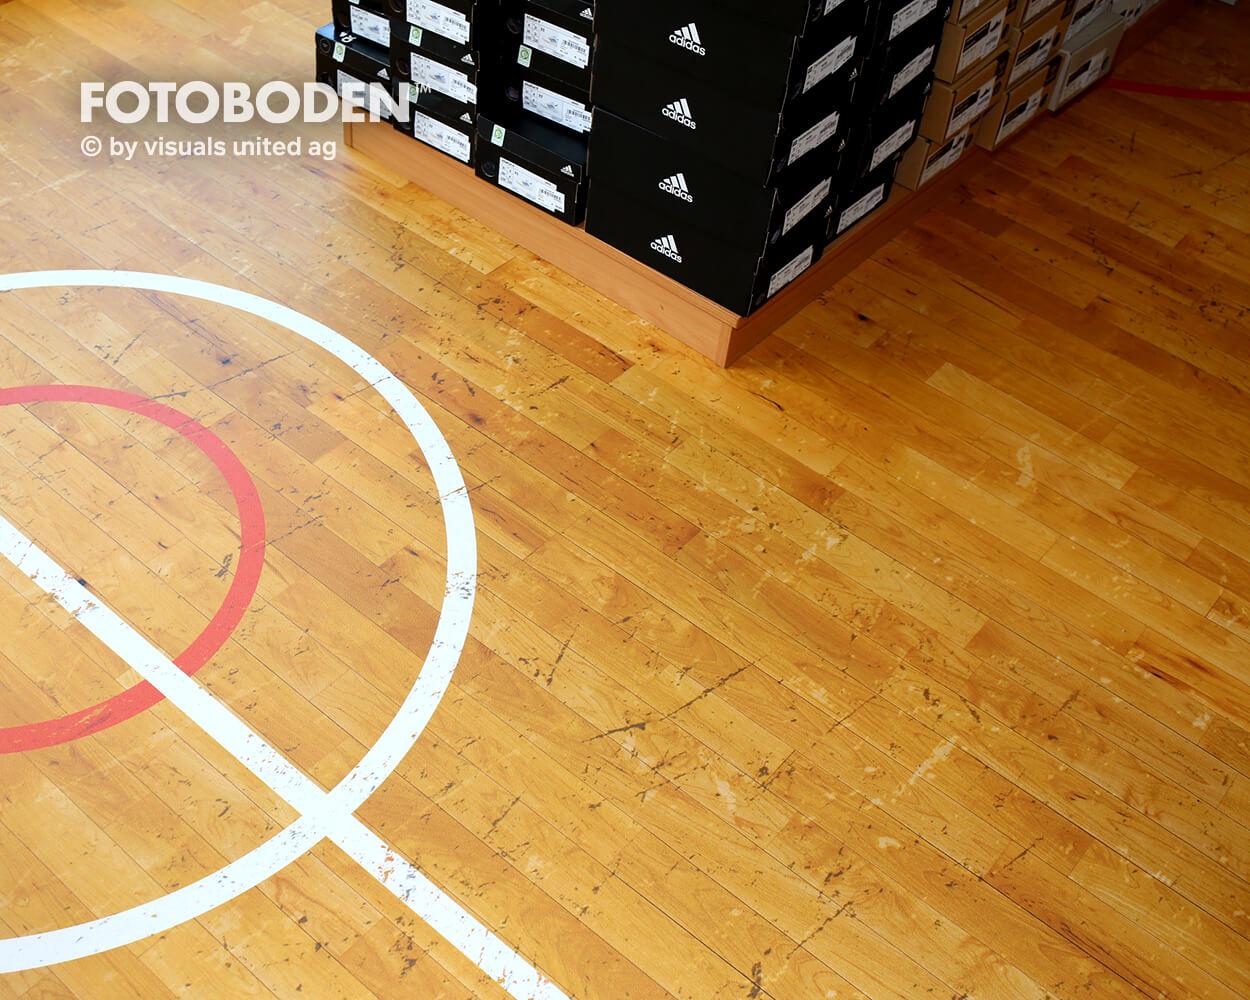 Sport3Ladenbau Ladengestaltung Fußboden Verkaufsfläche Bodengestaltung Boden Foto Fotoboden Fotomotiv Motiv Druck Visual Merchandising Point Of Sale POS